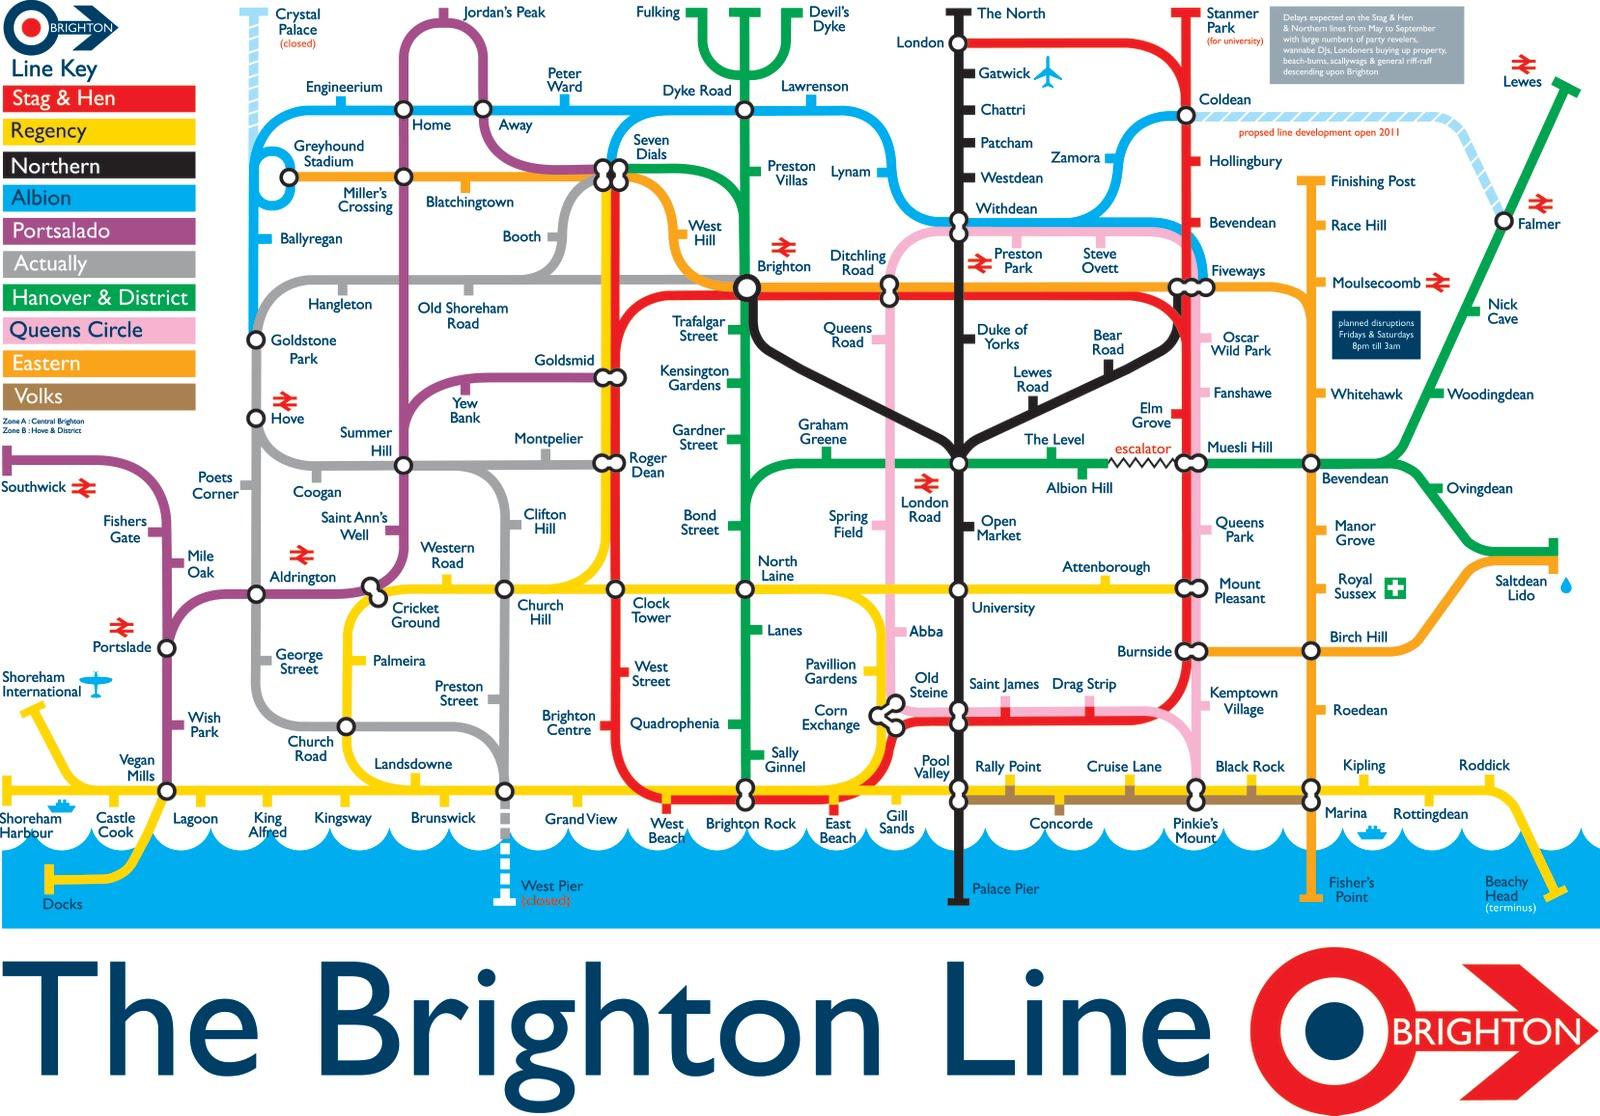 The Brighton Line Northern Light